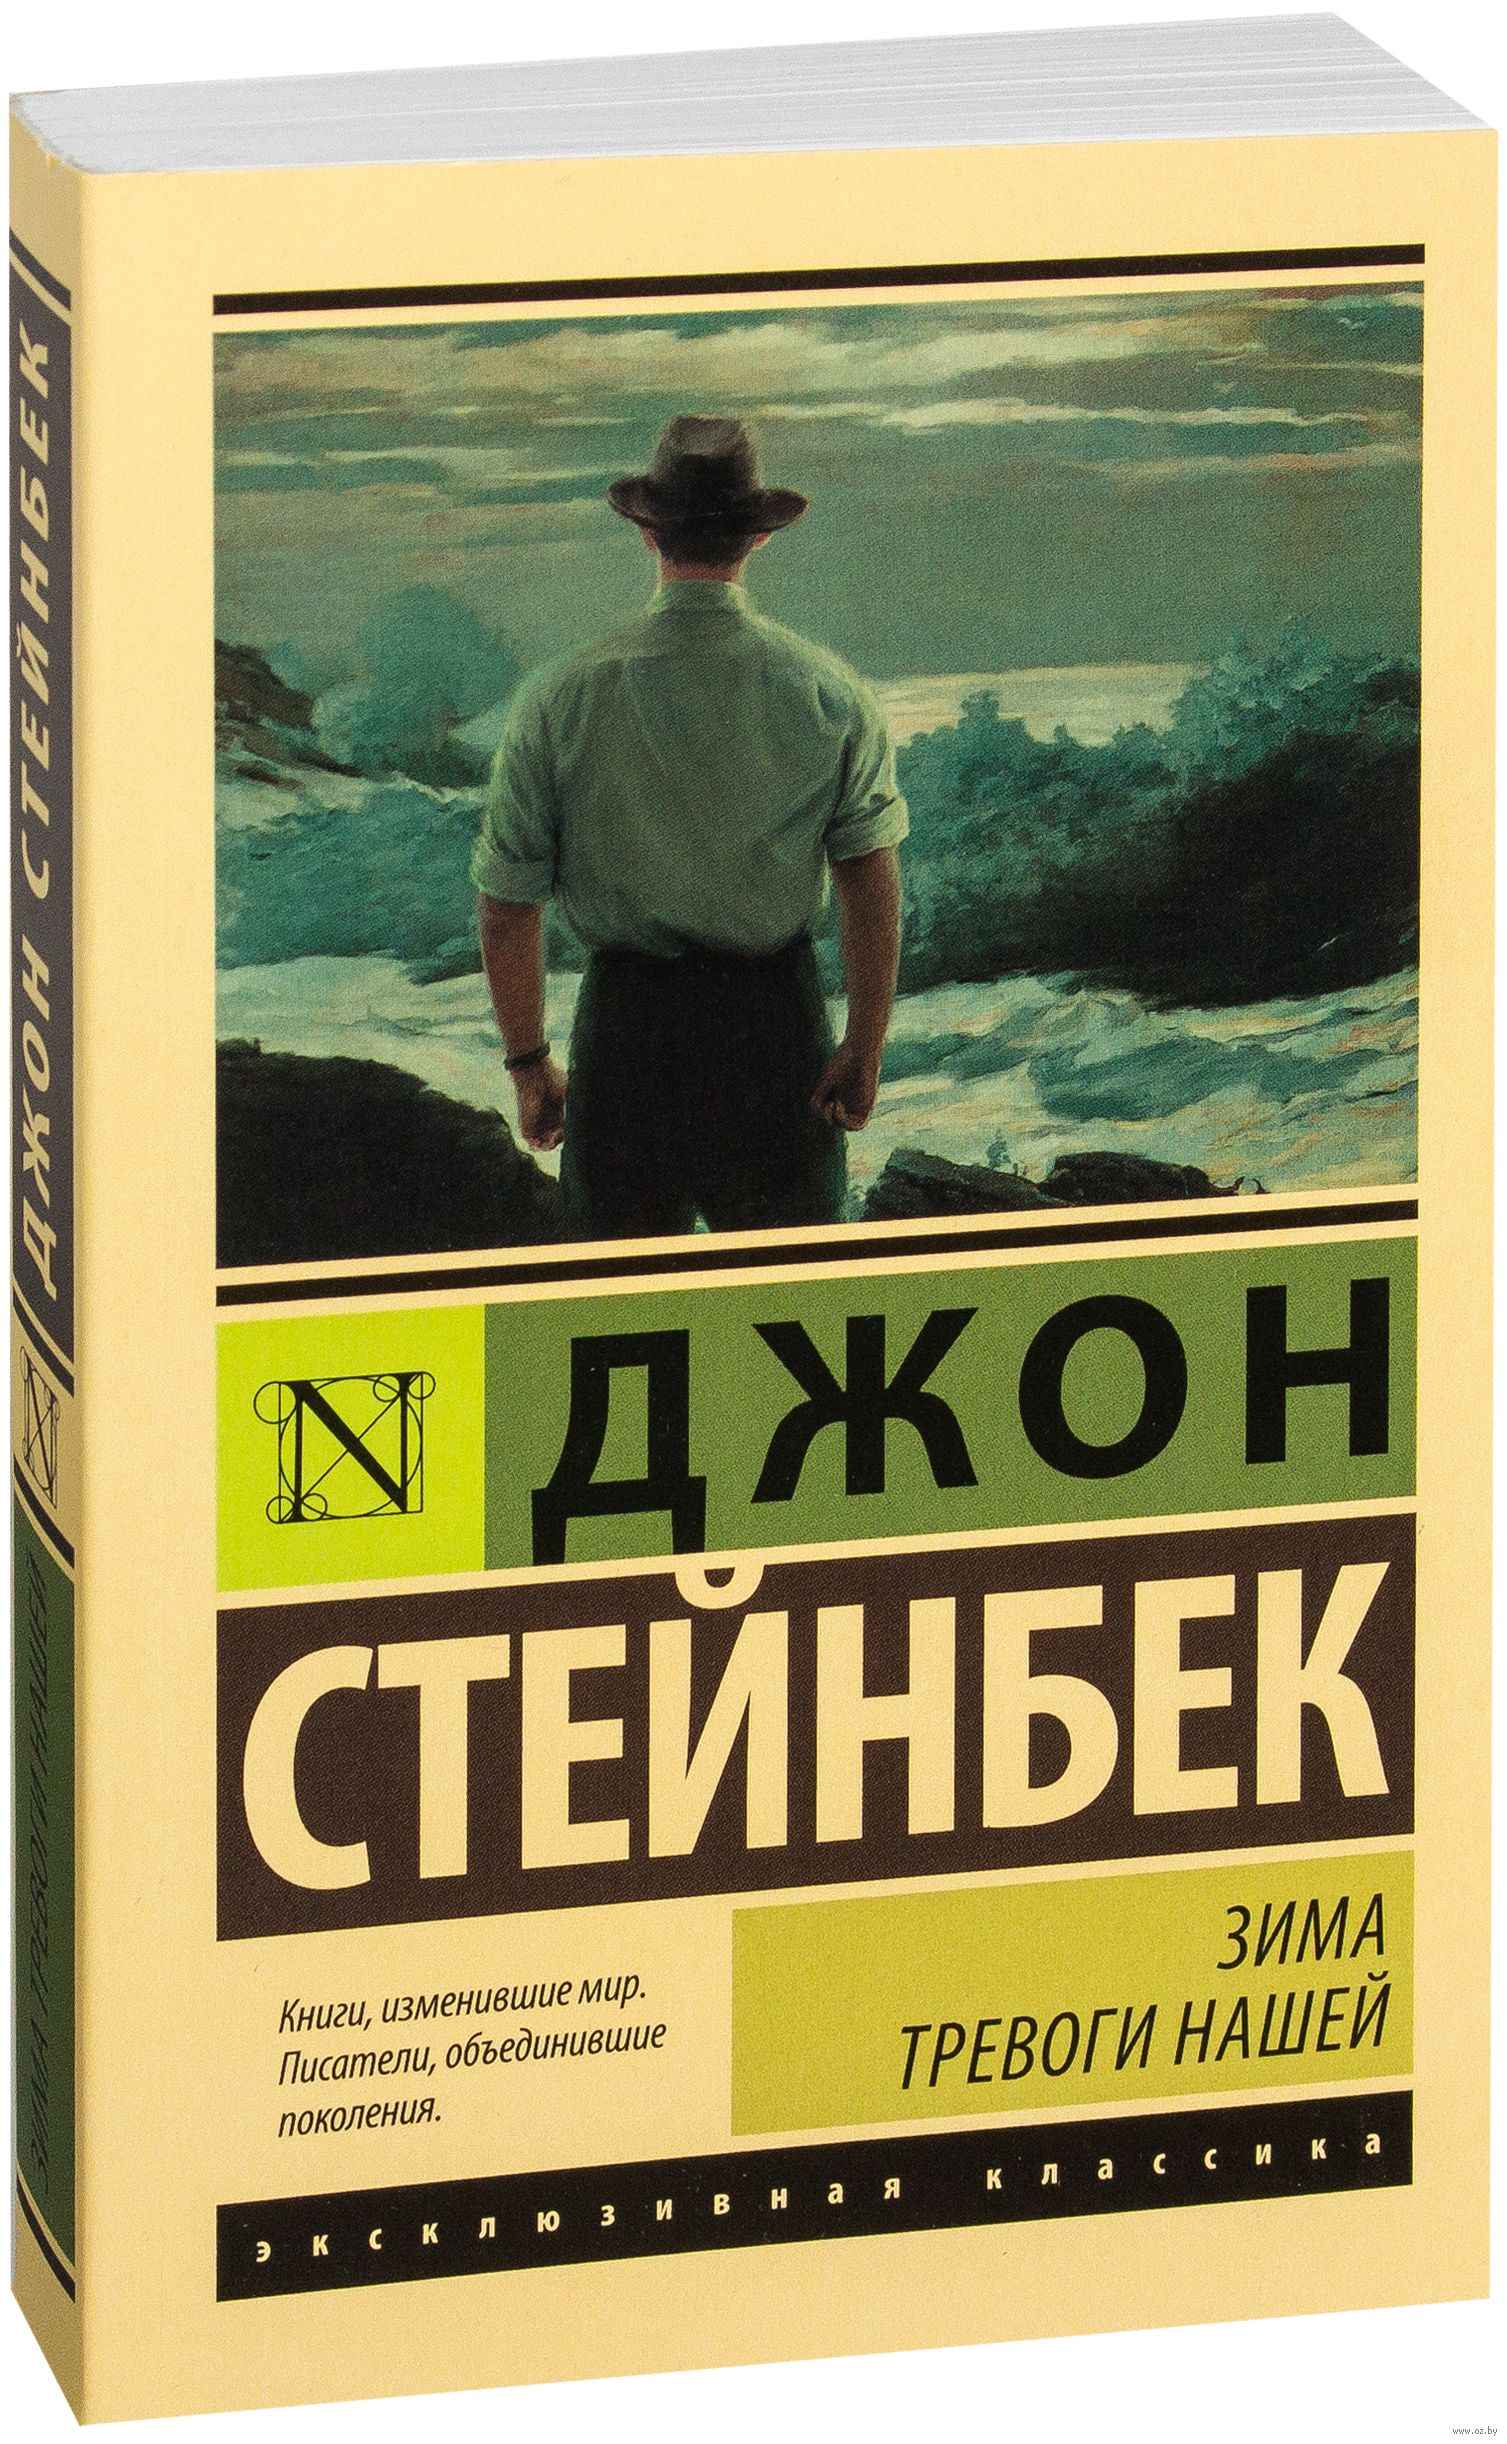 Image result for Жон Стейнбек (John Steinbeck) зима тревоги